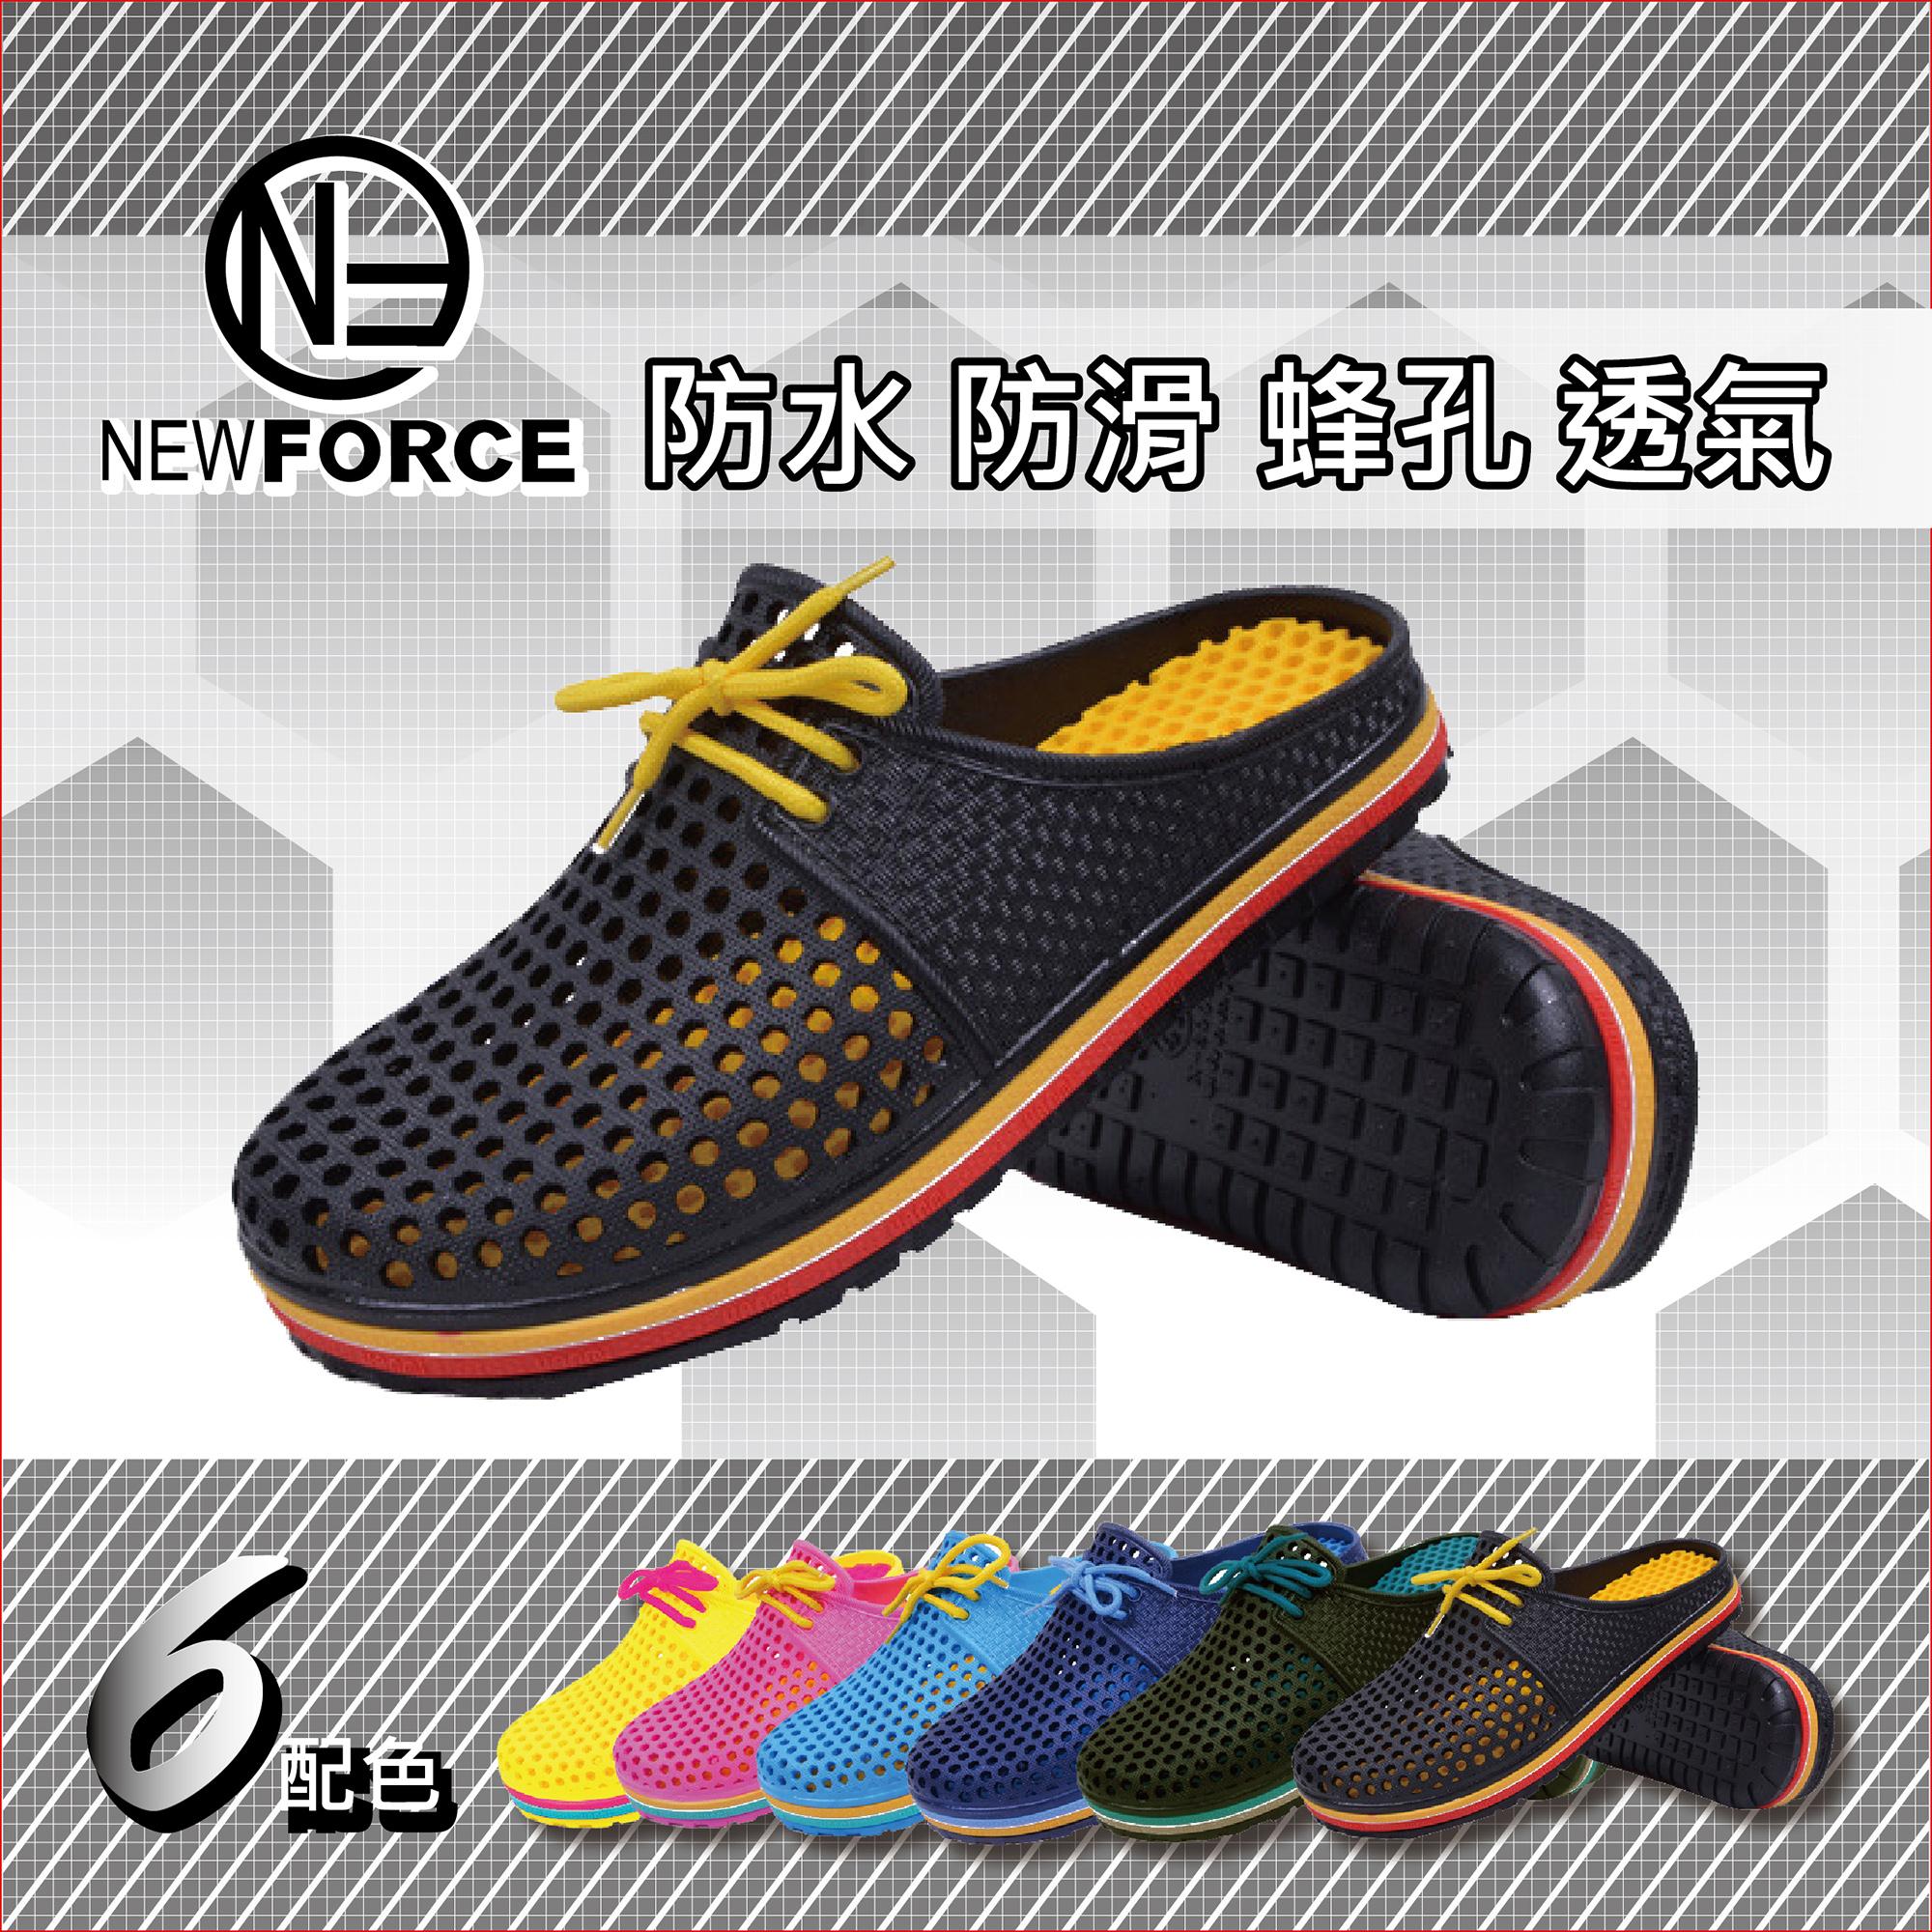 【NEW FORCE】超動感軟Q情侶洞洞鞋 - 男款/3色可選【6010105】